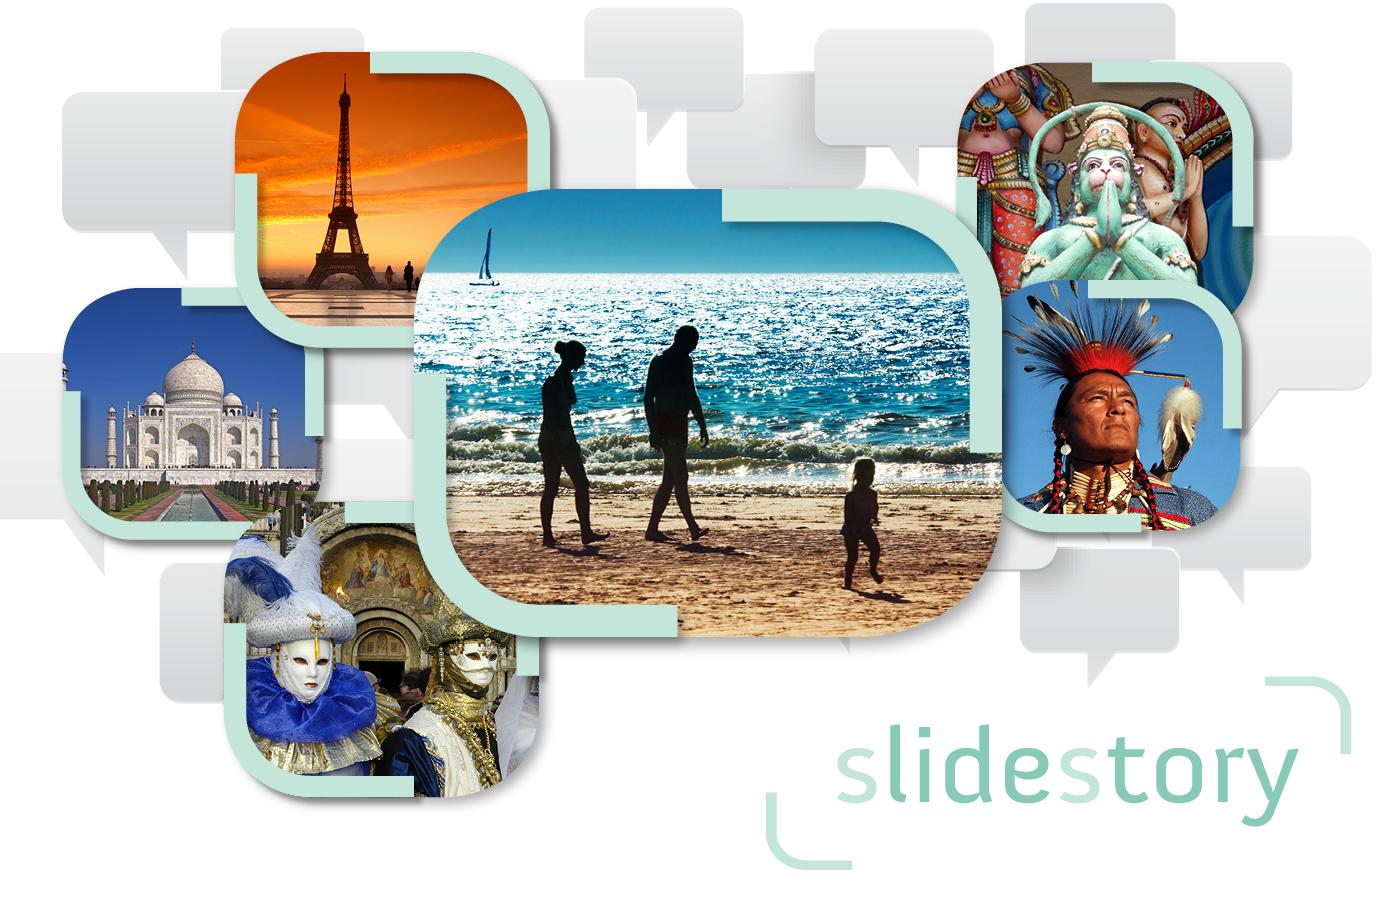 slidestory-pl-grafika2